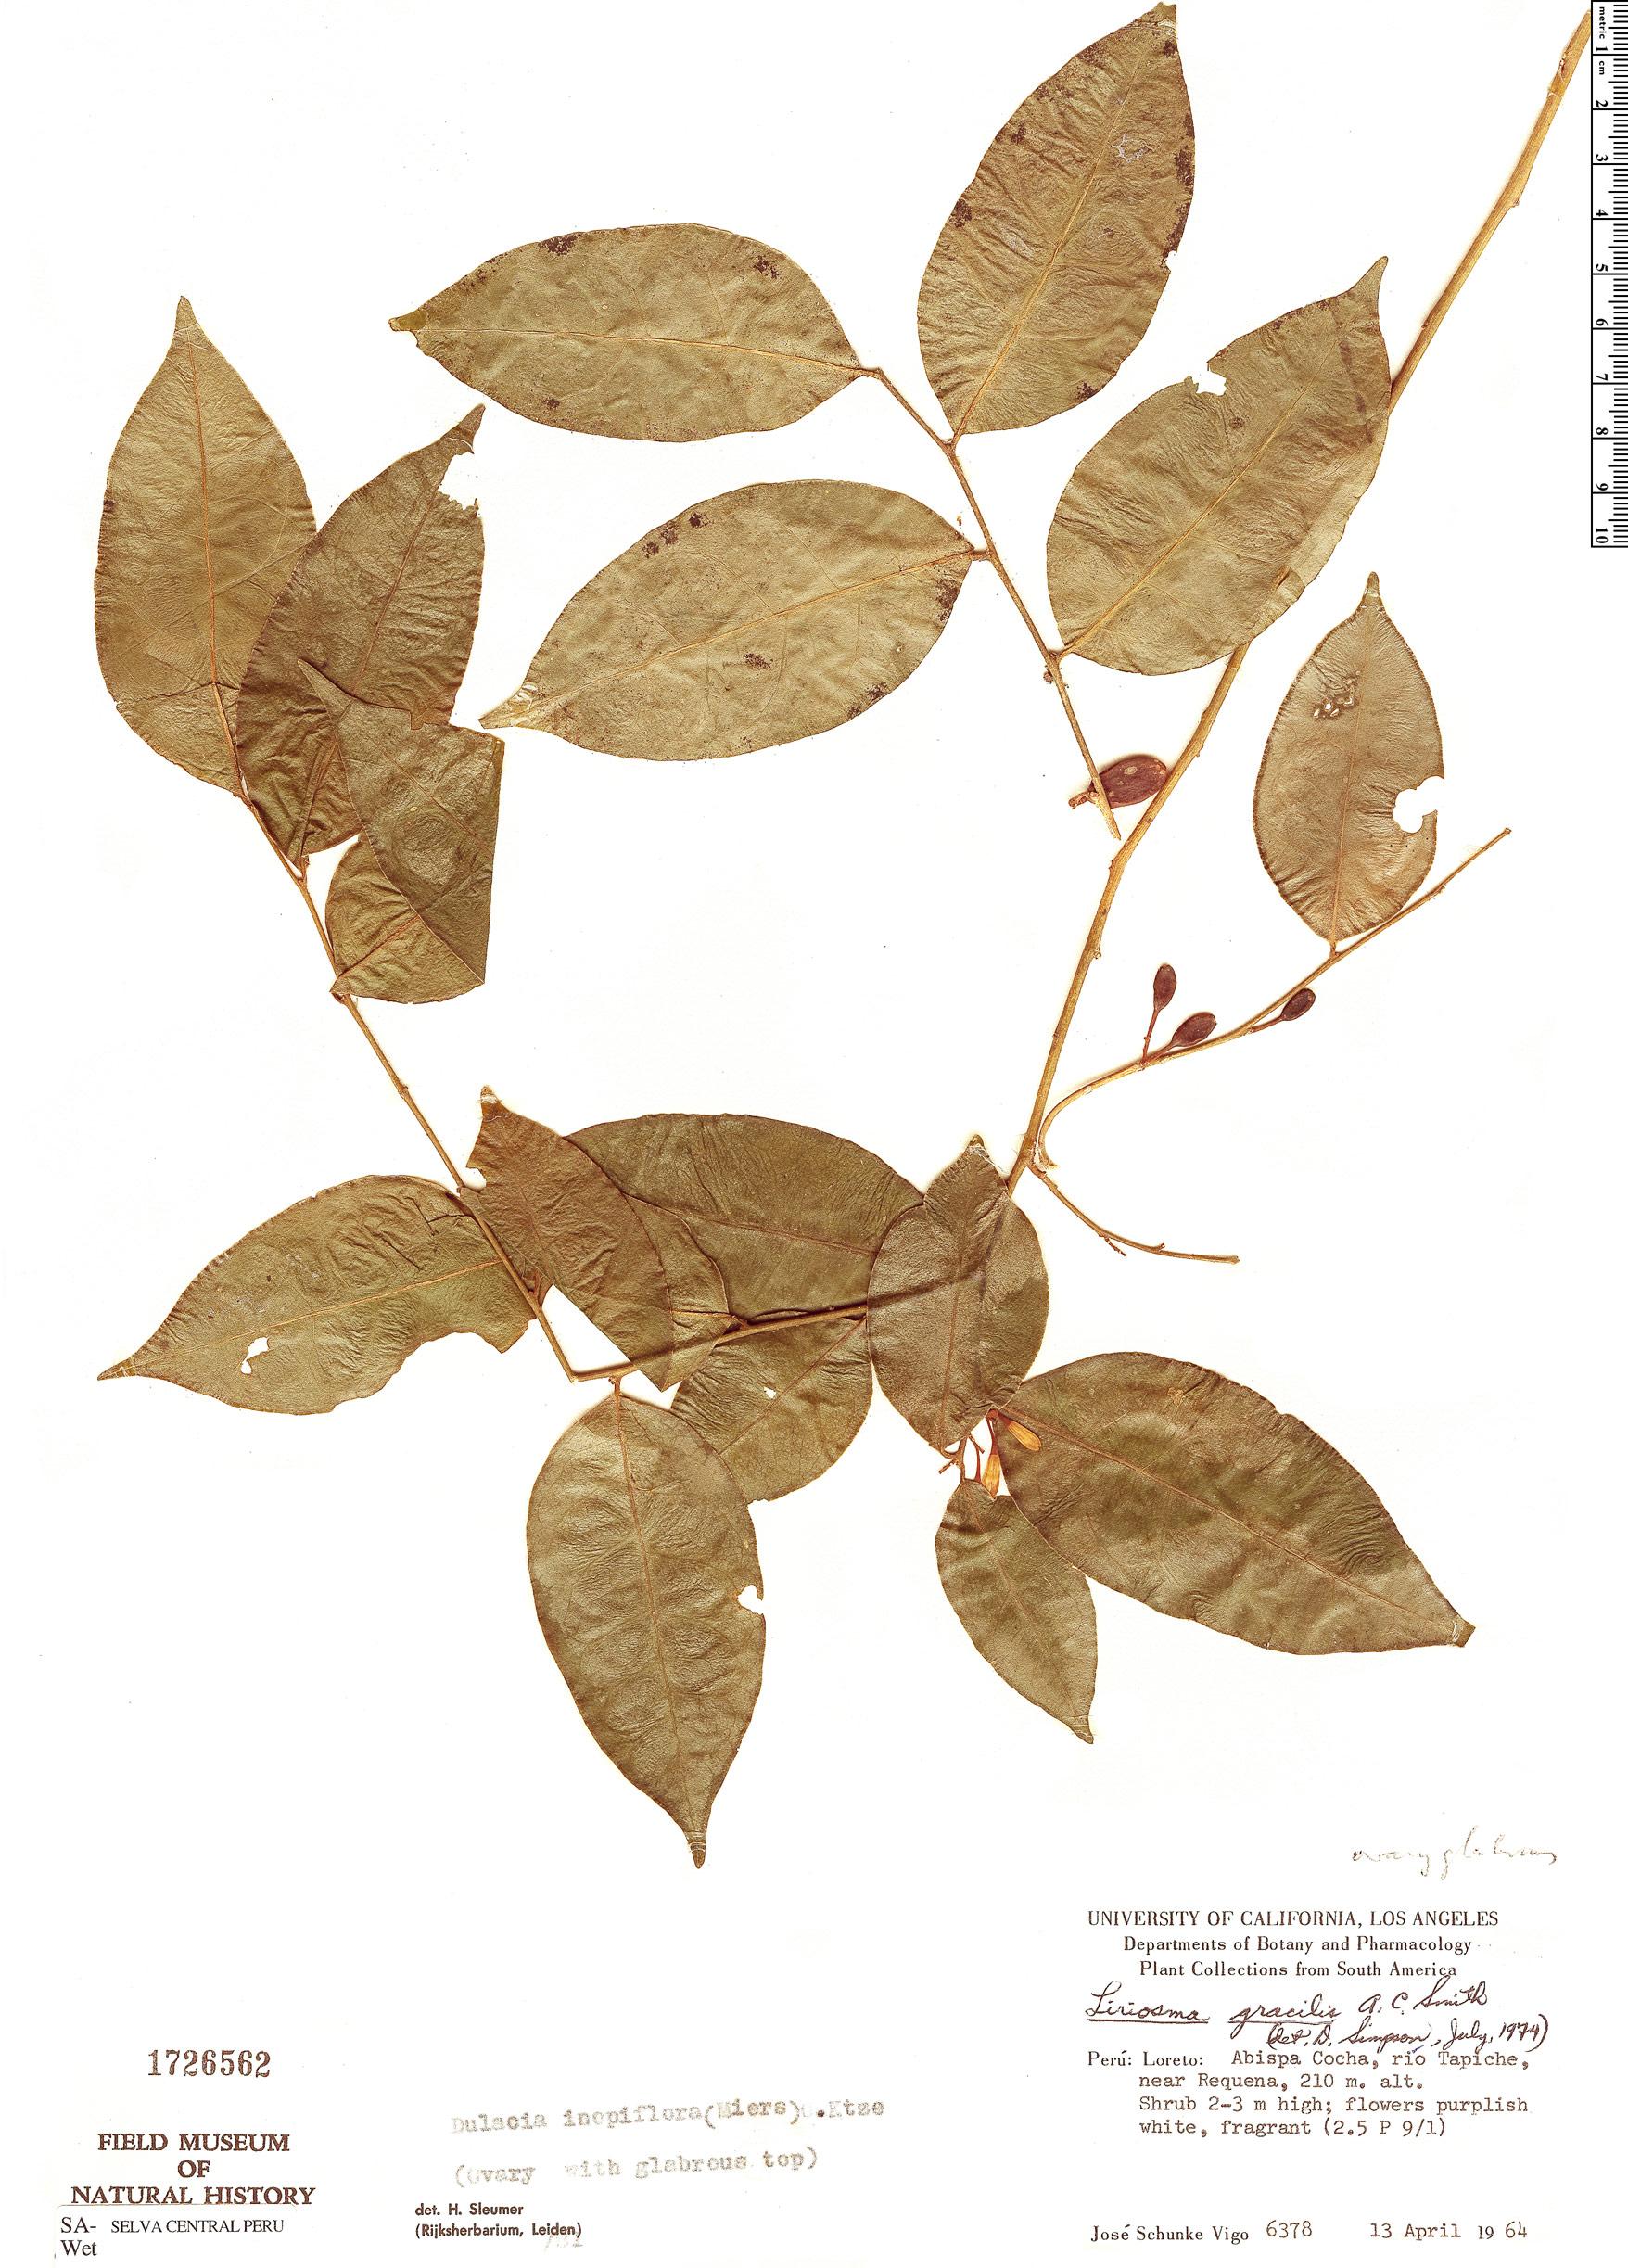 Specimen: Dulacia inopiflora